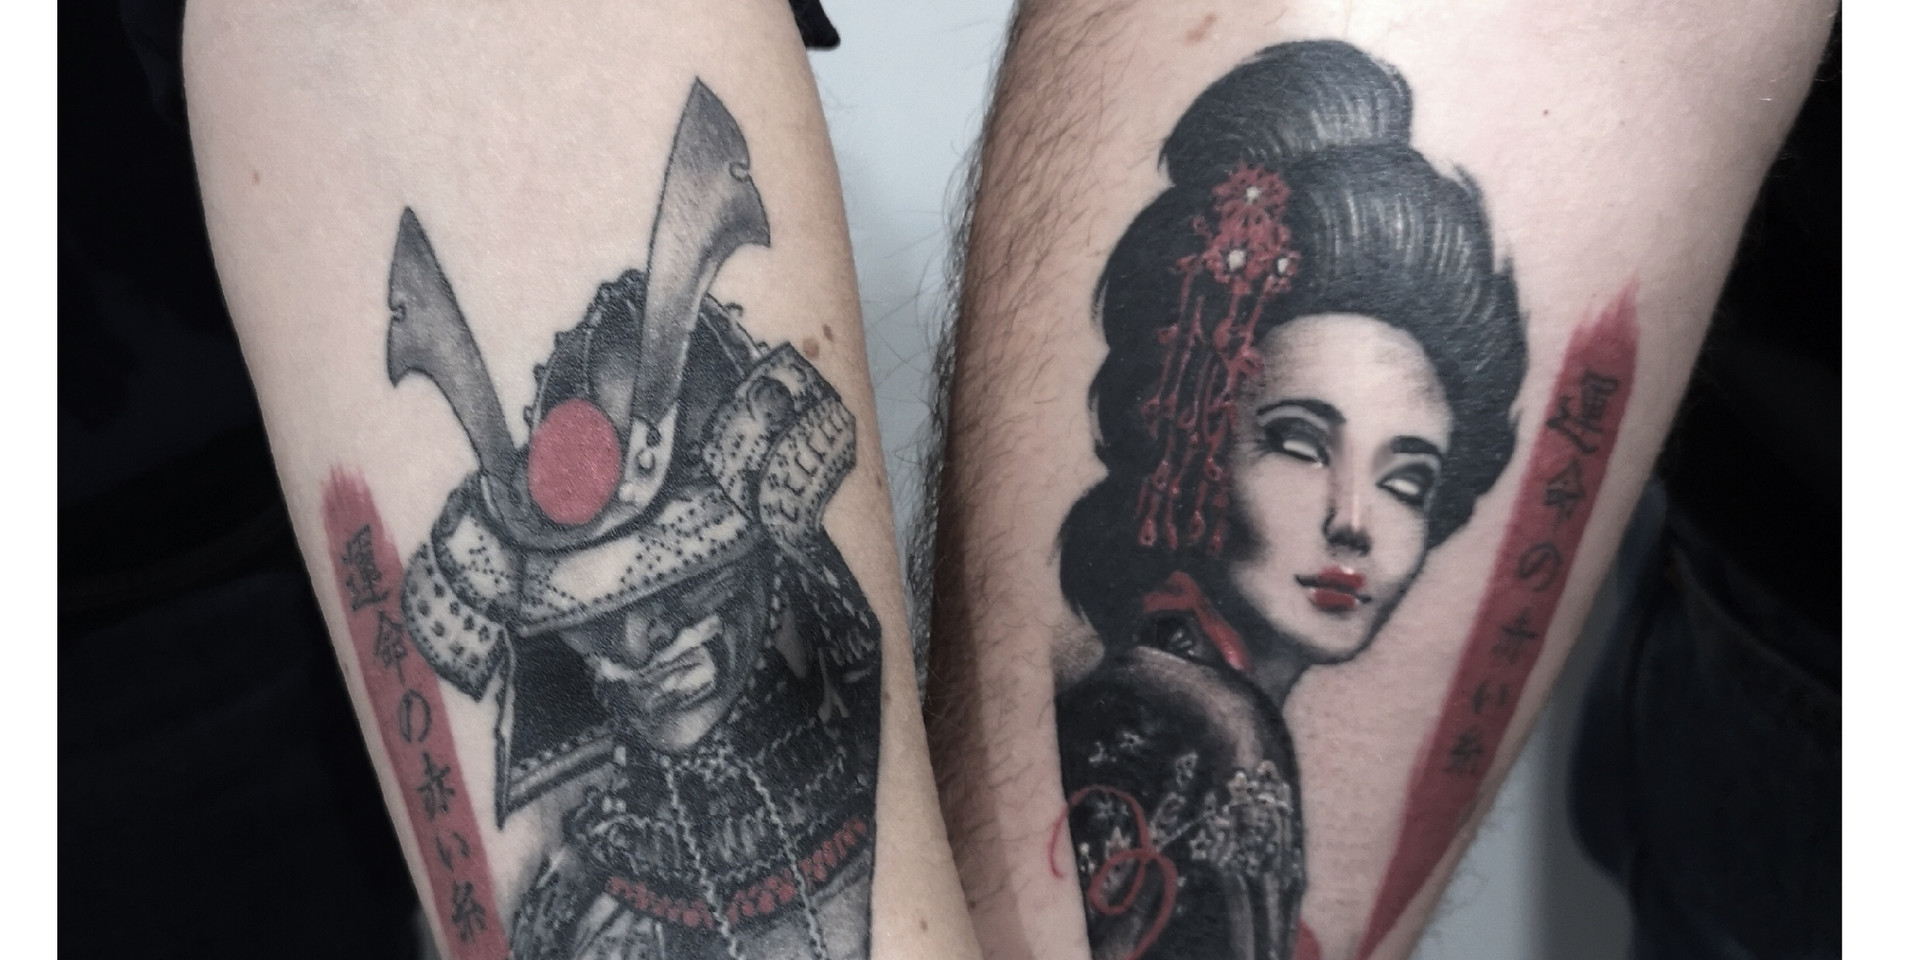 Tatouage Samourai et portrait femme asiatique